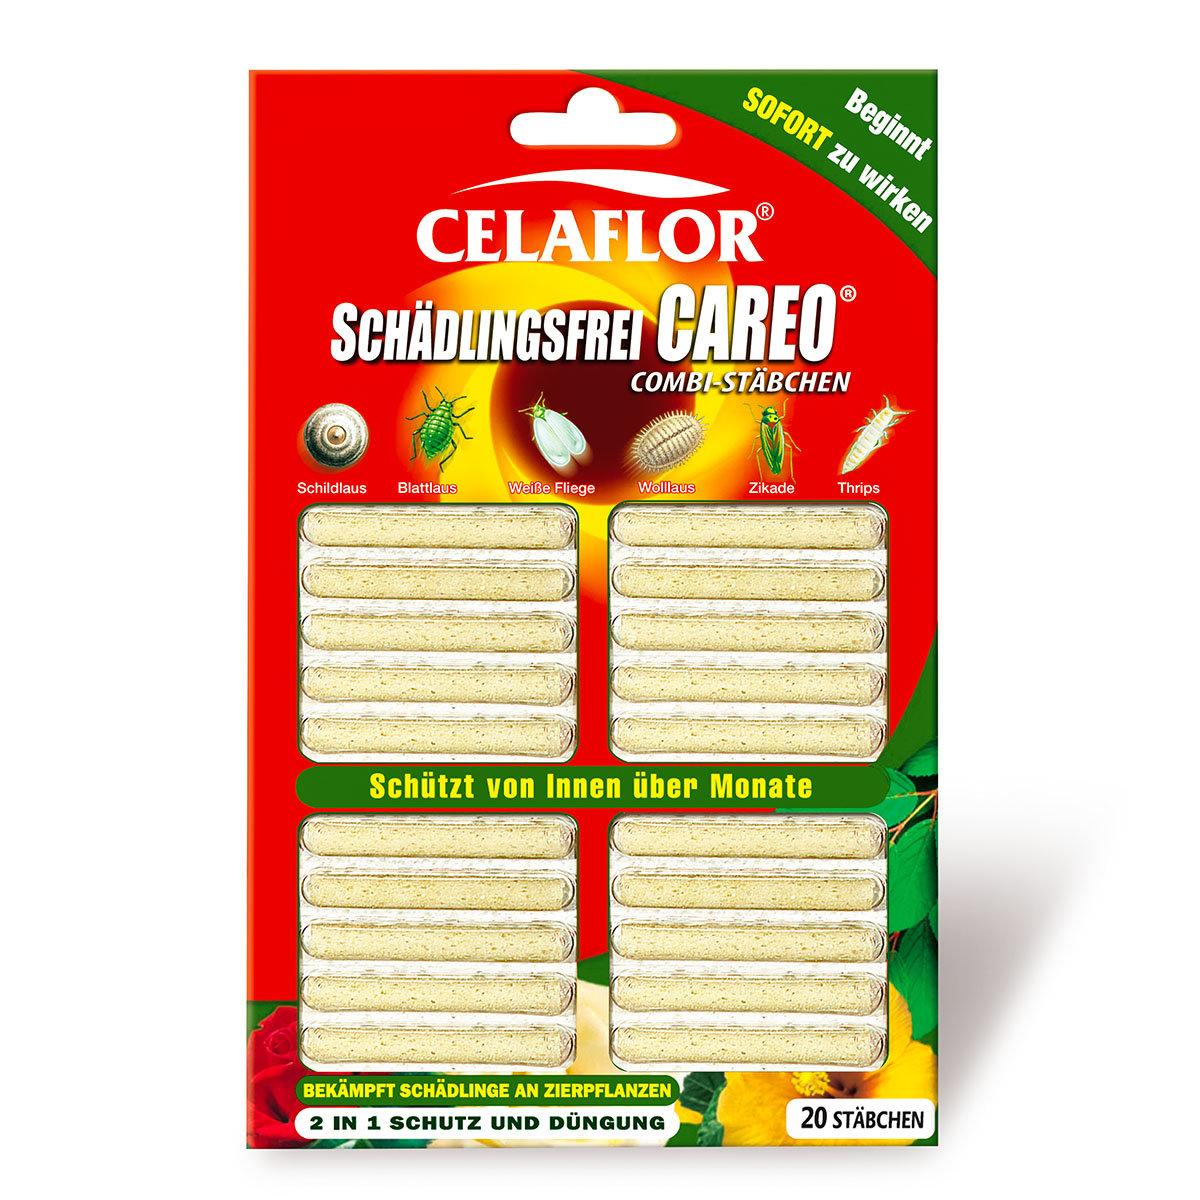 Celaflor Schädlingsfrei Careo Combi-Stäbchen, 20 Stück